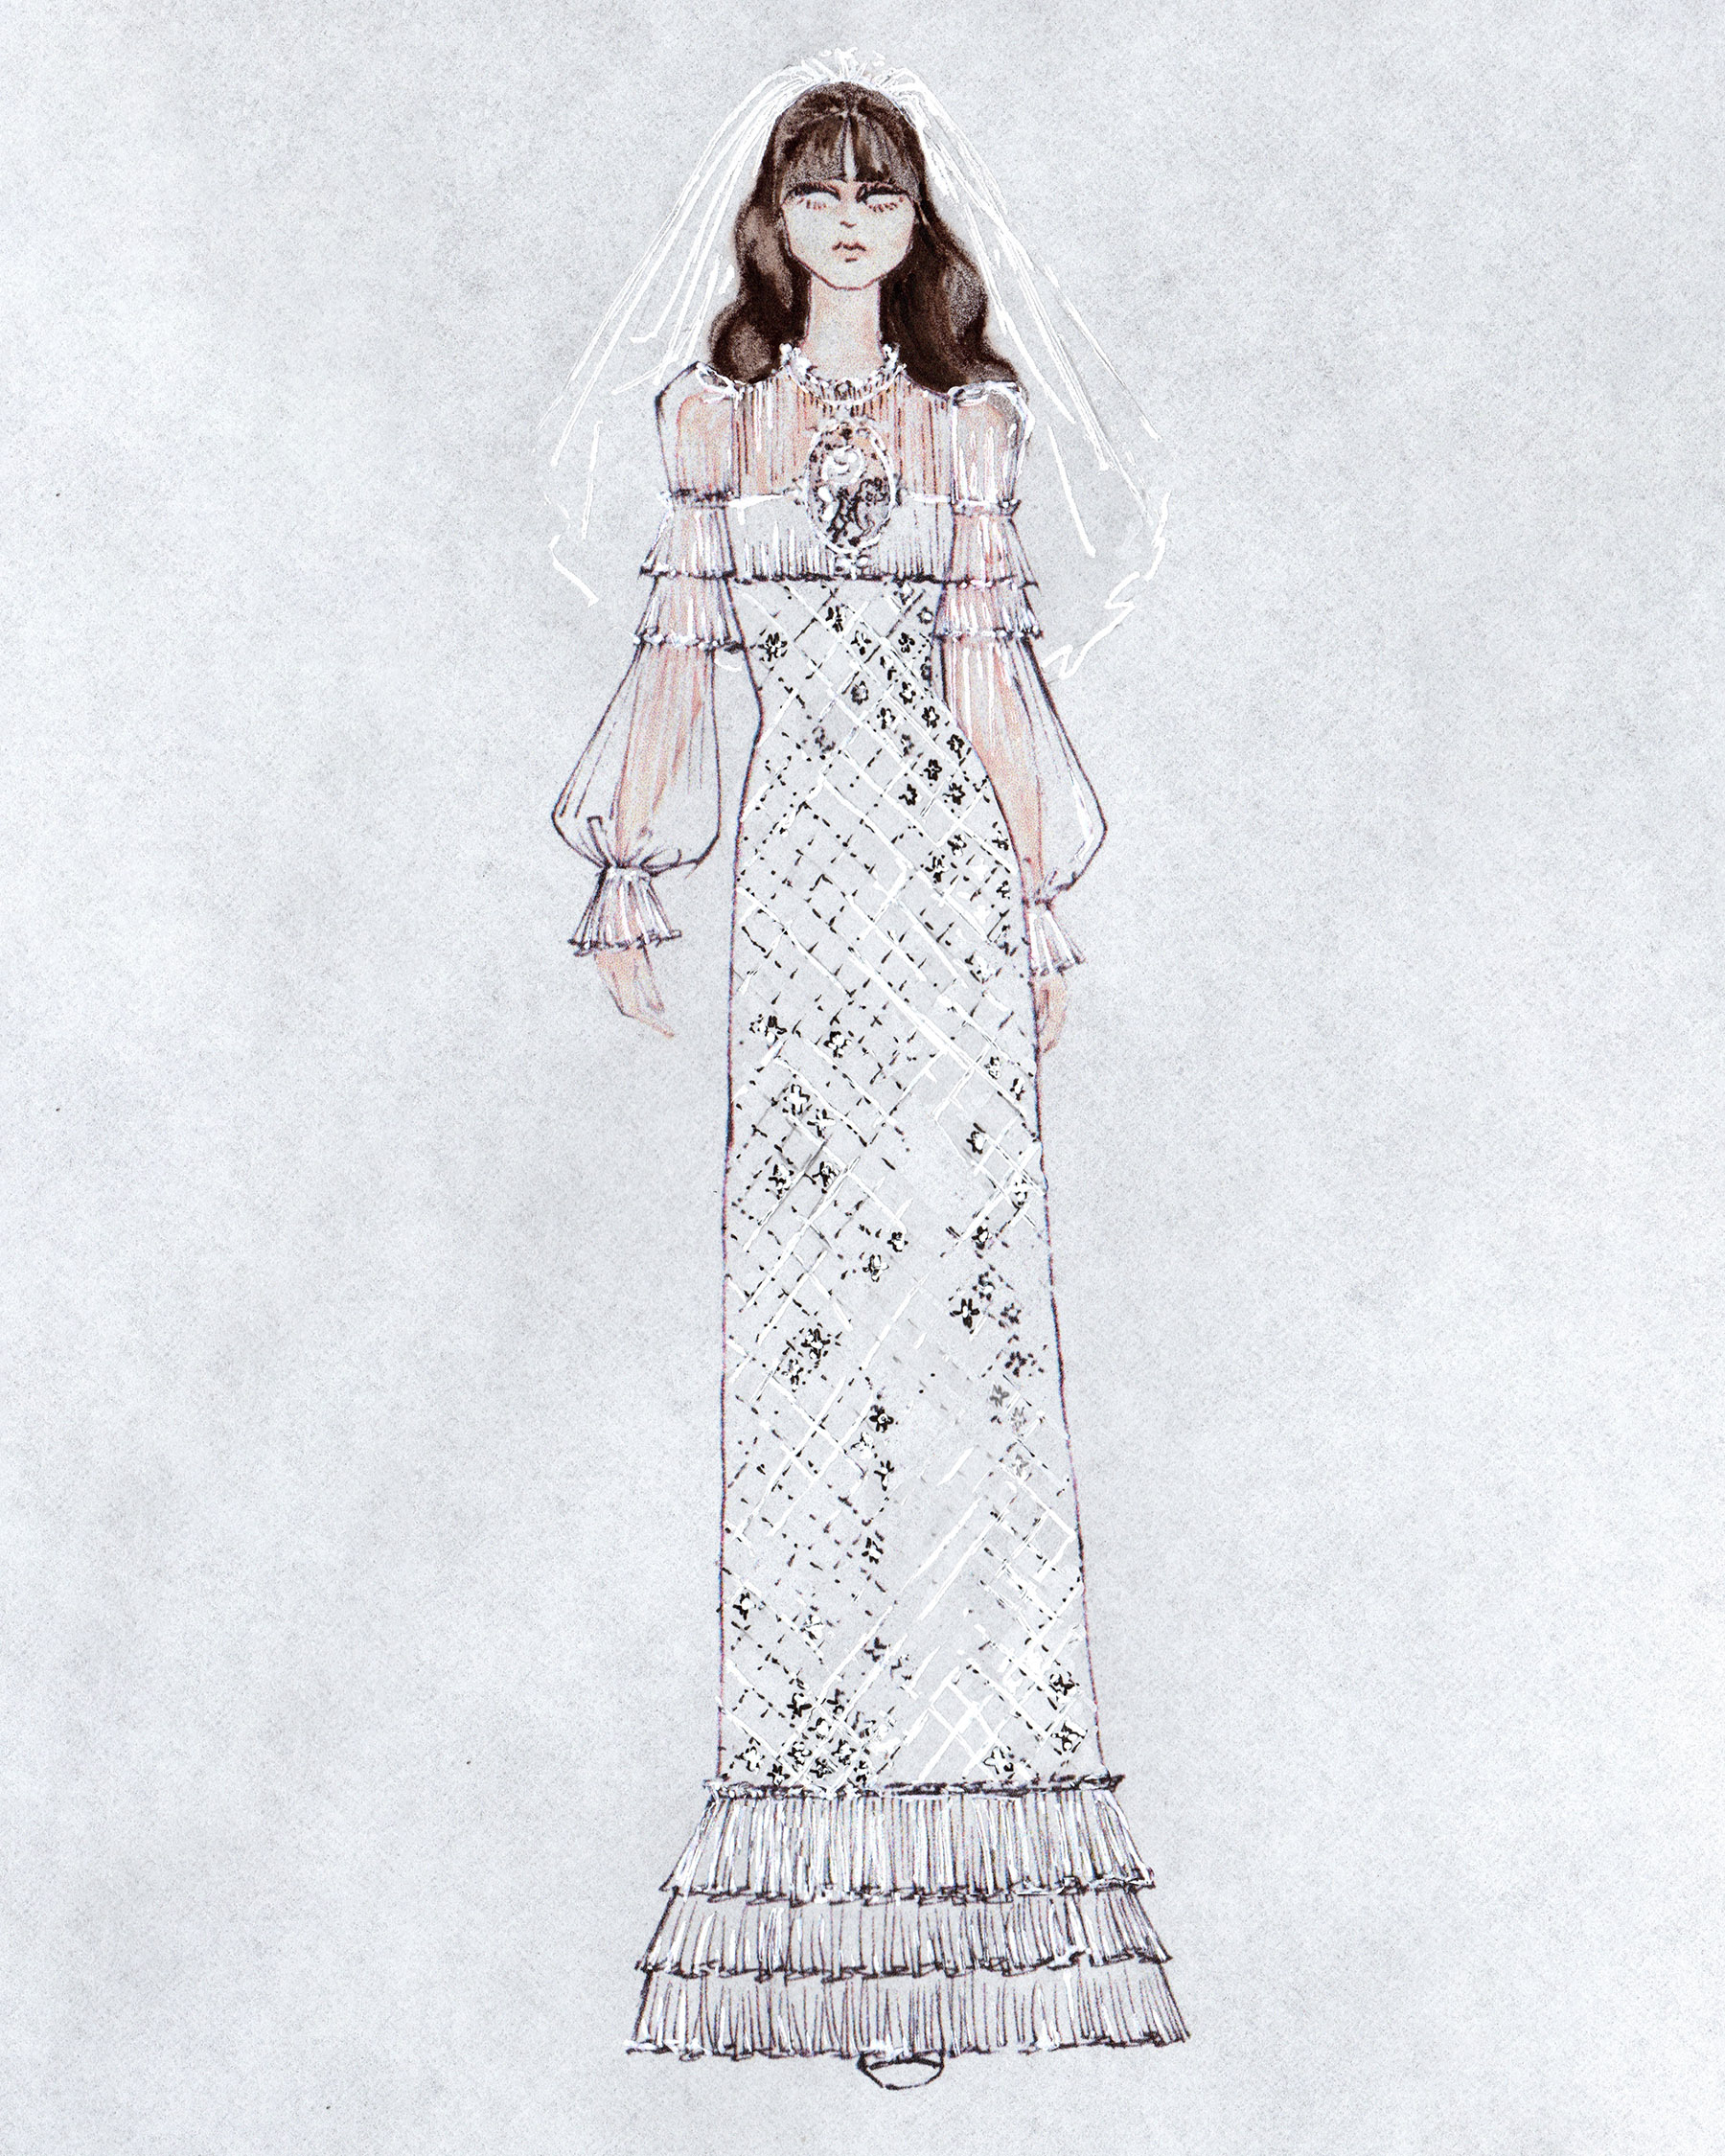 bridal fashion week sketches fall 2019 honor